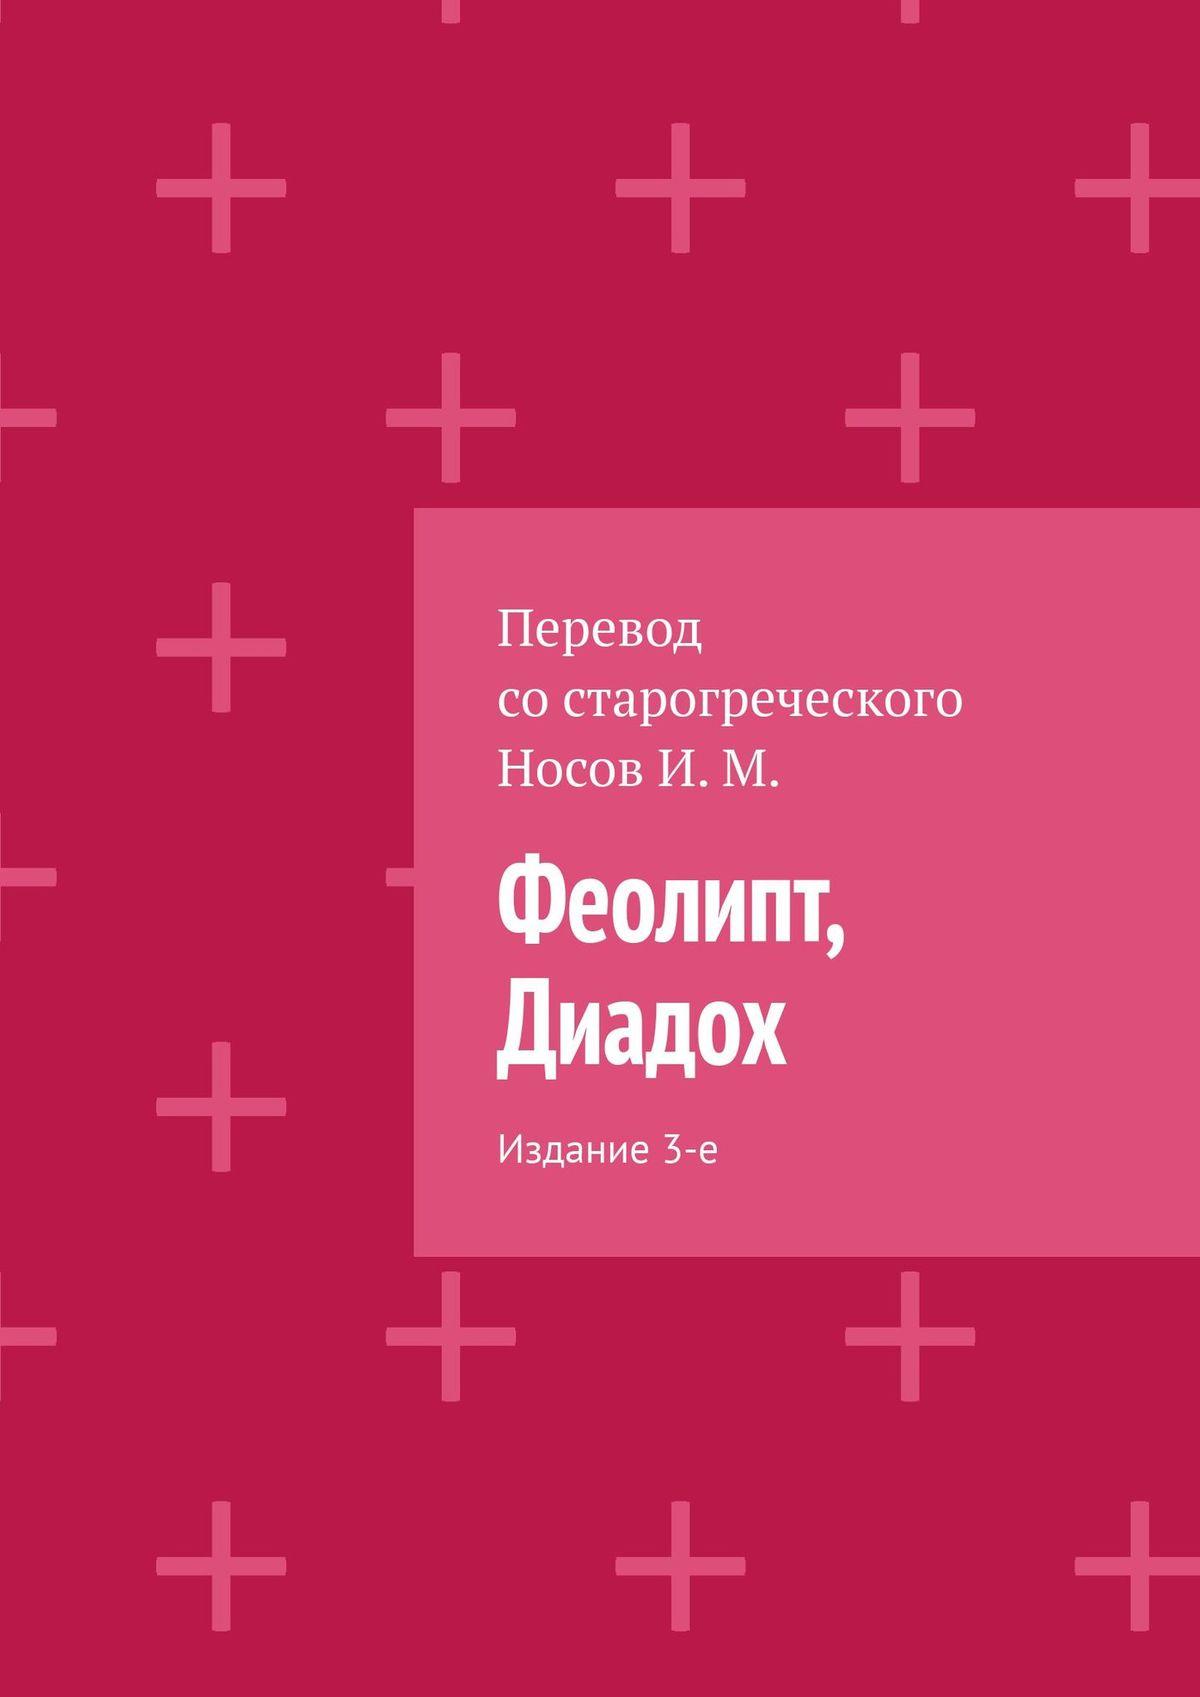 И. М. Носов Феолипт, Диадох. Издание2-е